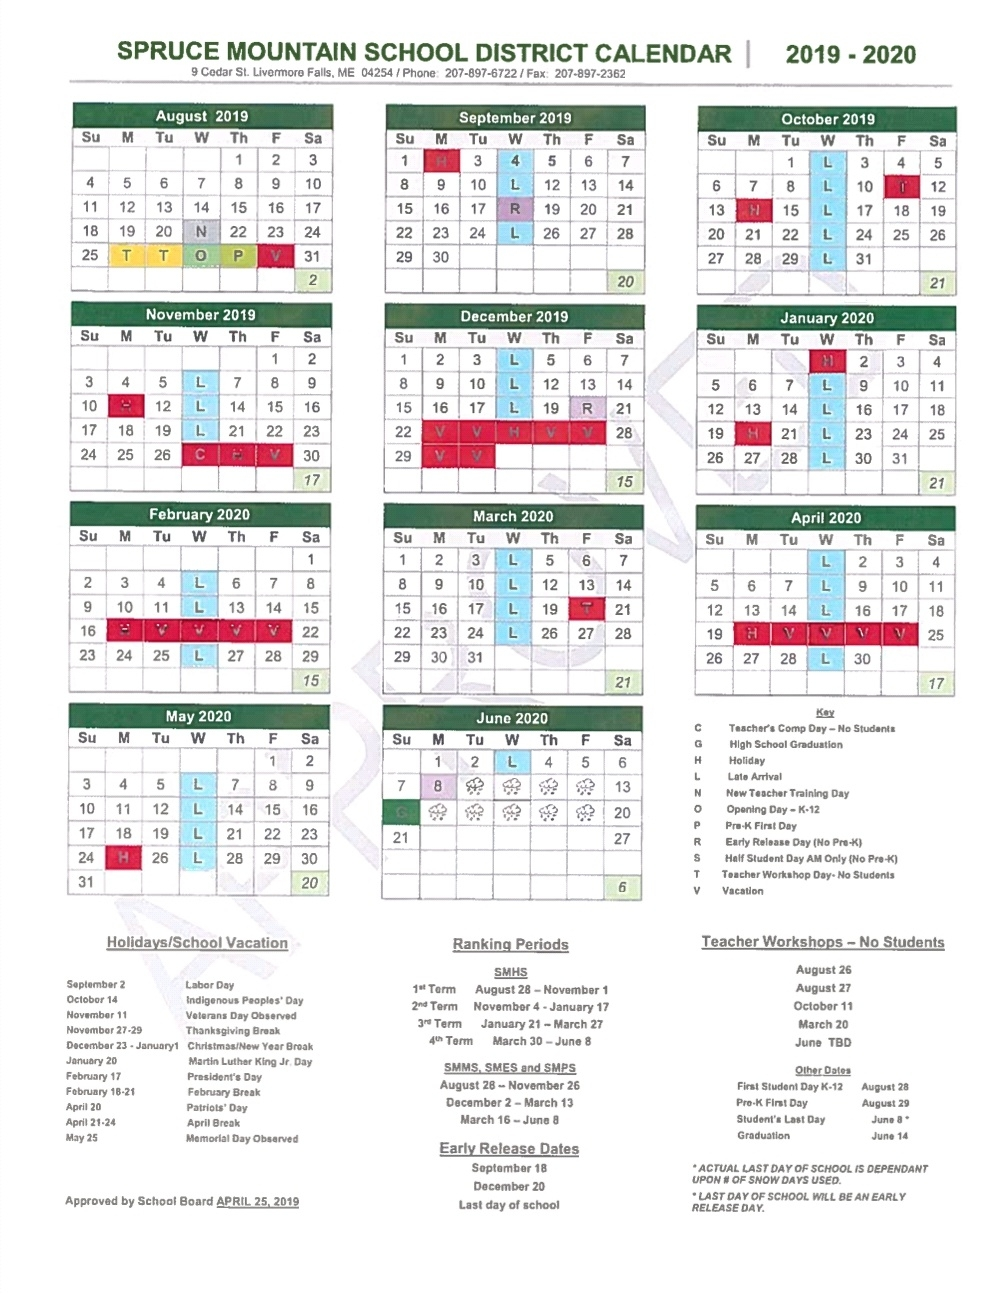 School Year Calendar - Spruce Mountain School District_Rsu 2 School Calendar